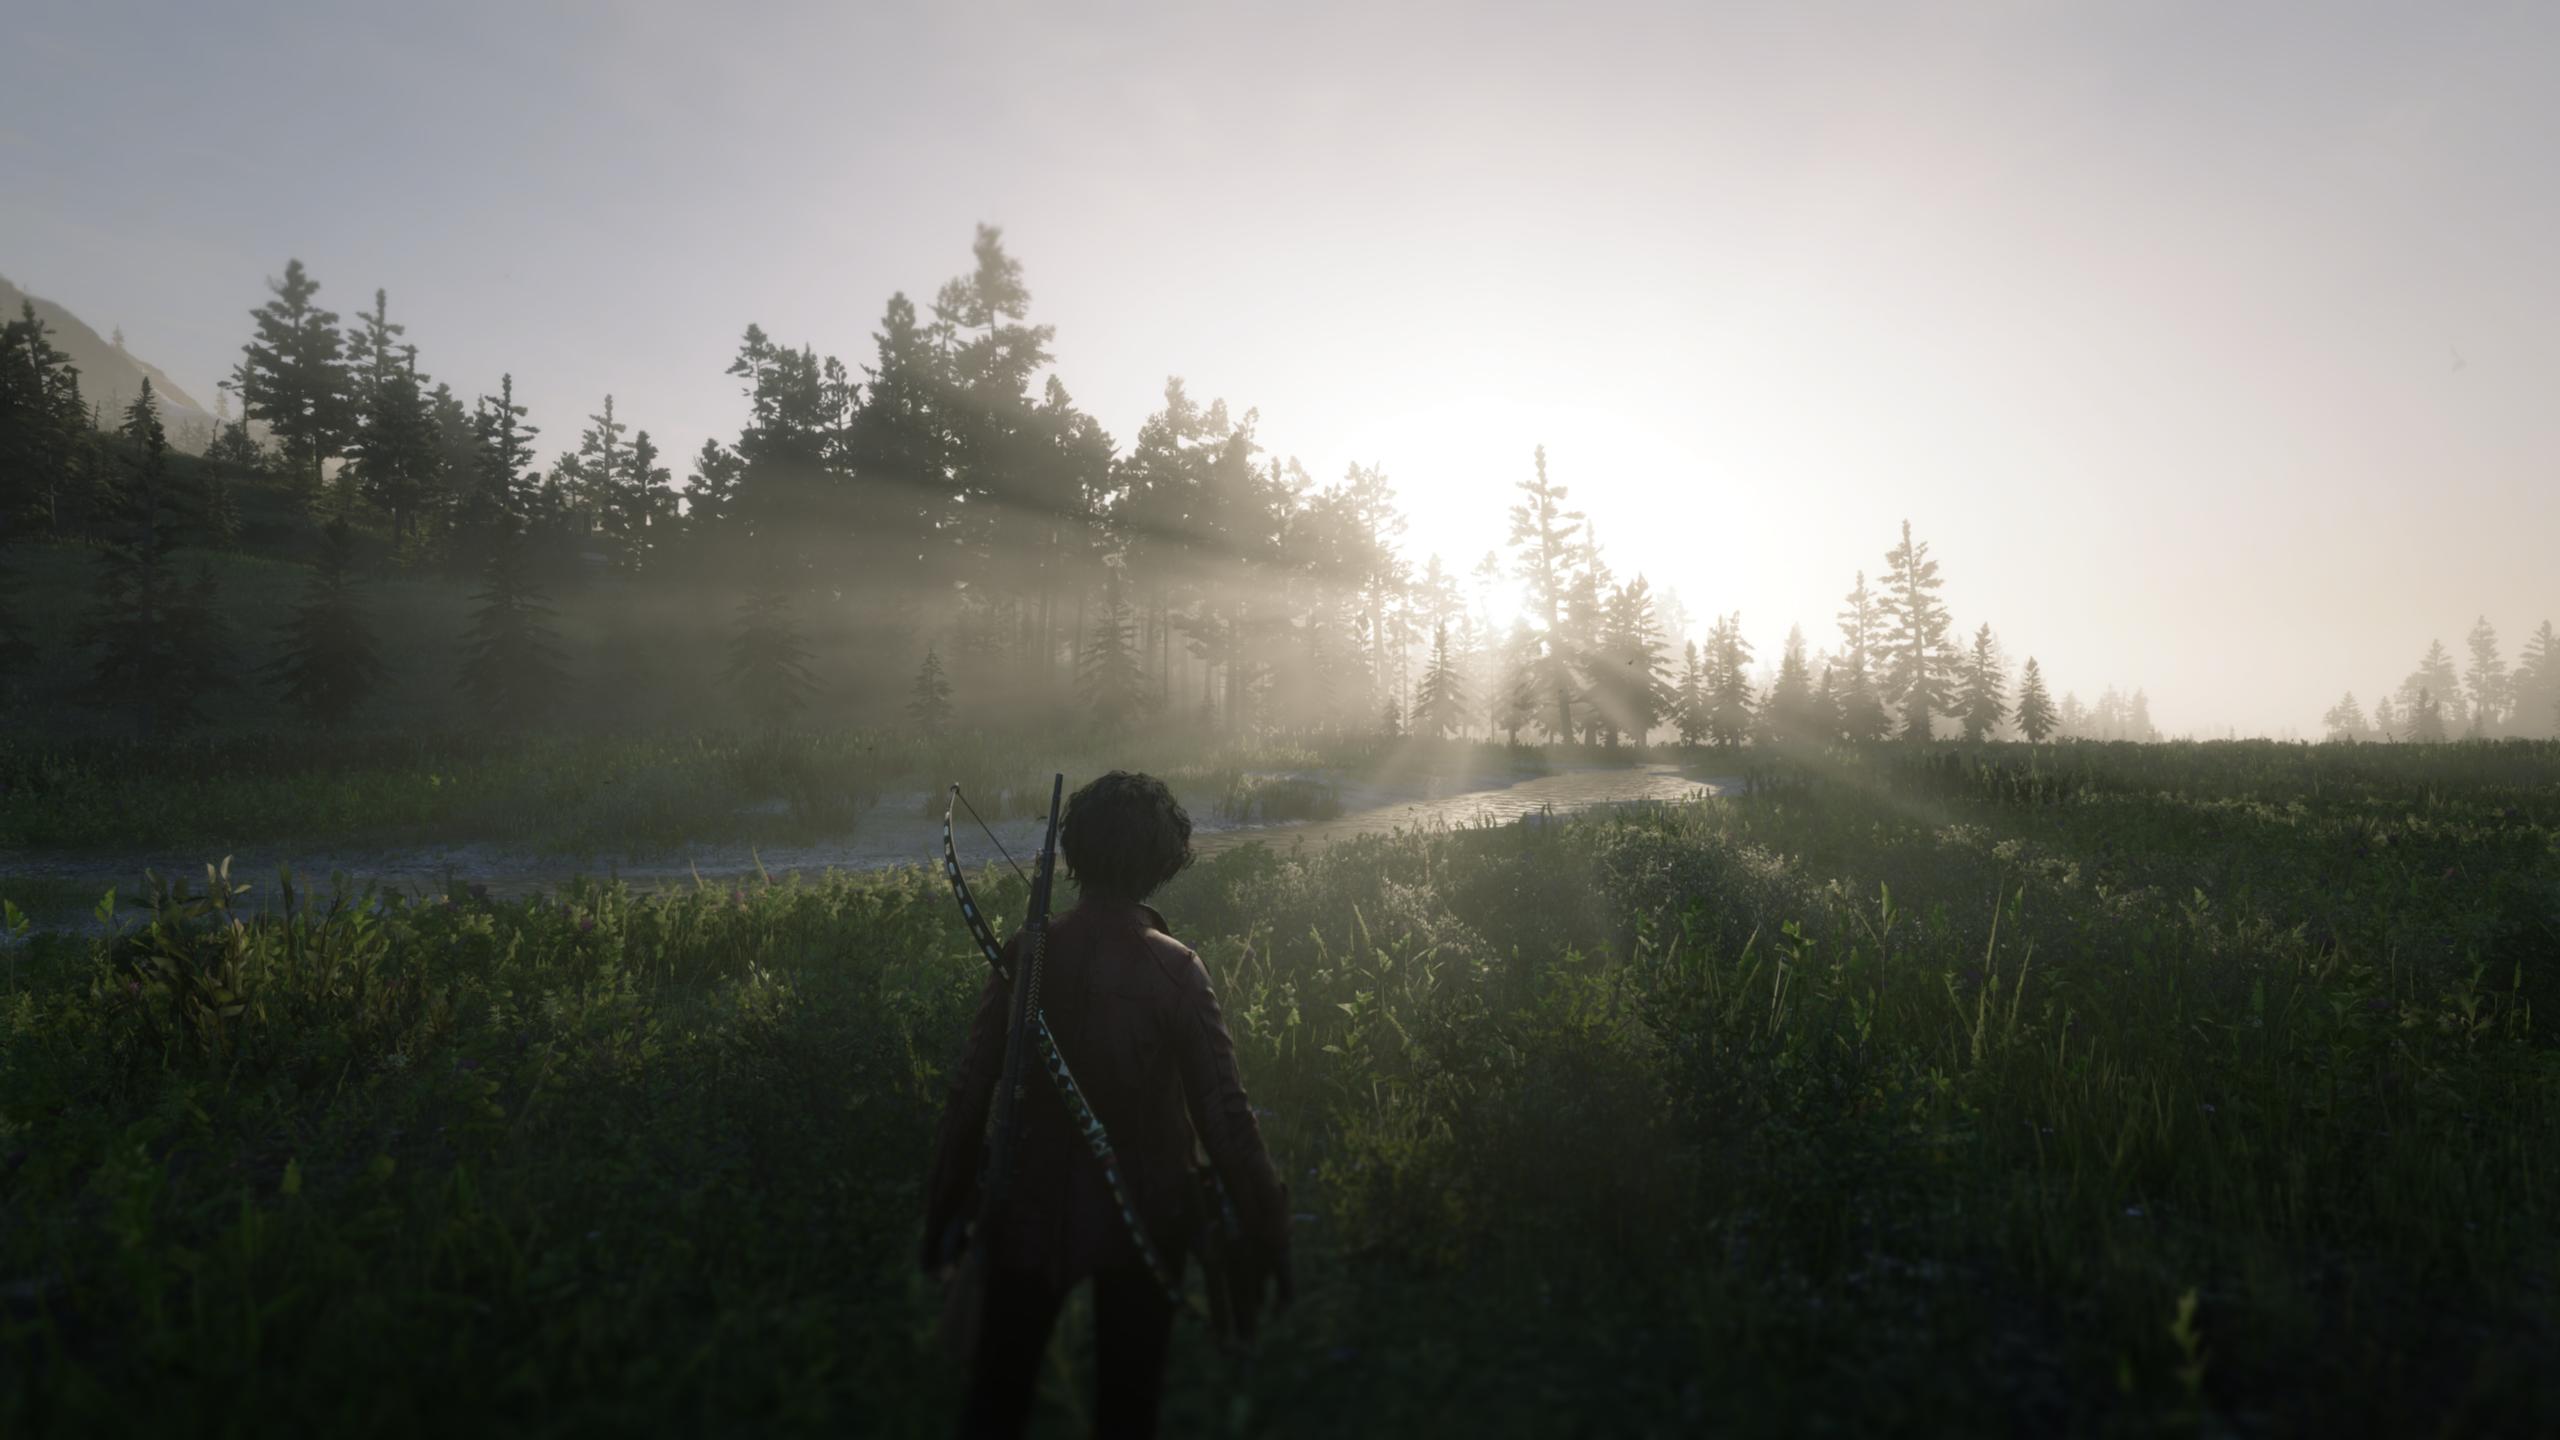 Red Dead Redemption 2 Screenshot 2021.01.08 - 14.37.10.48.png - Red Dead Redemption 2